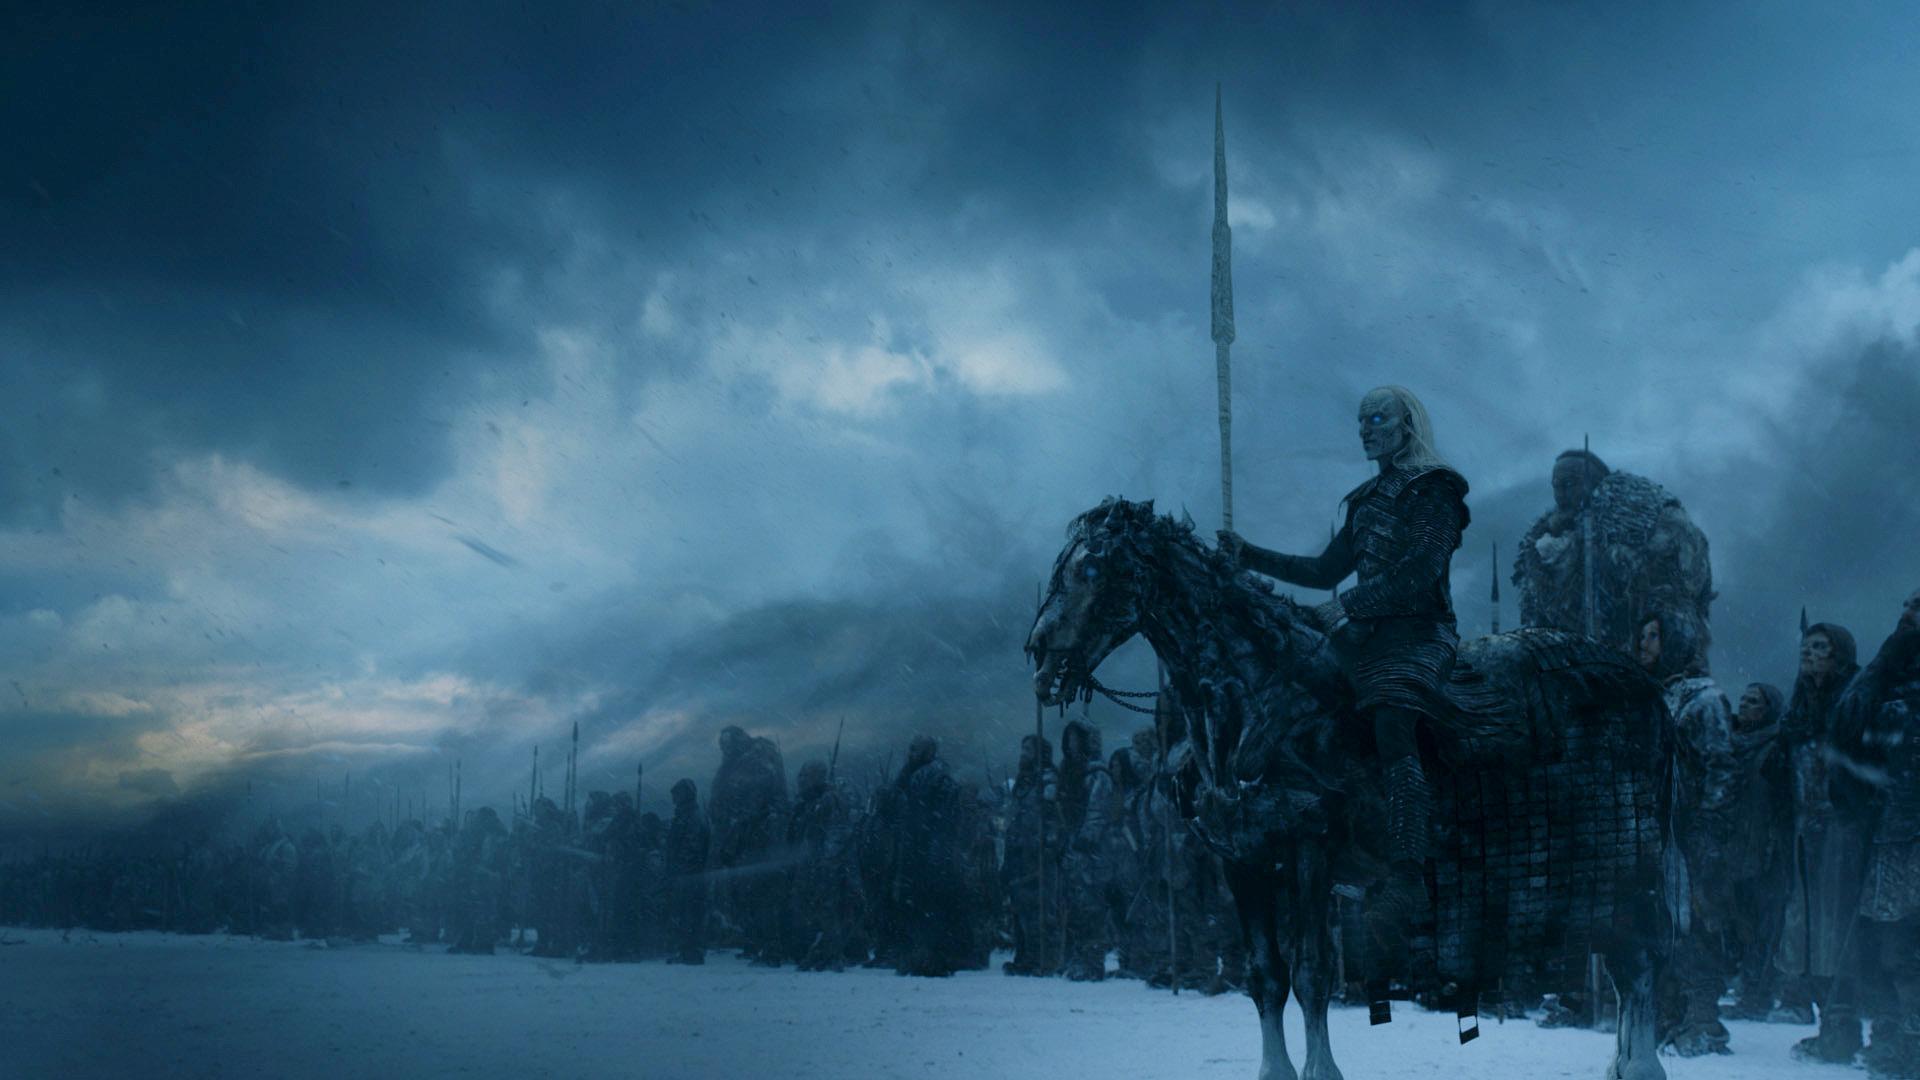 gra o tron nocny król hbo